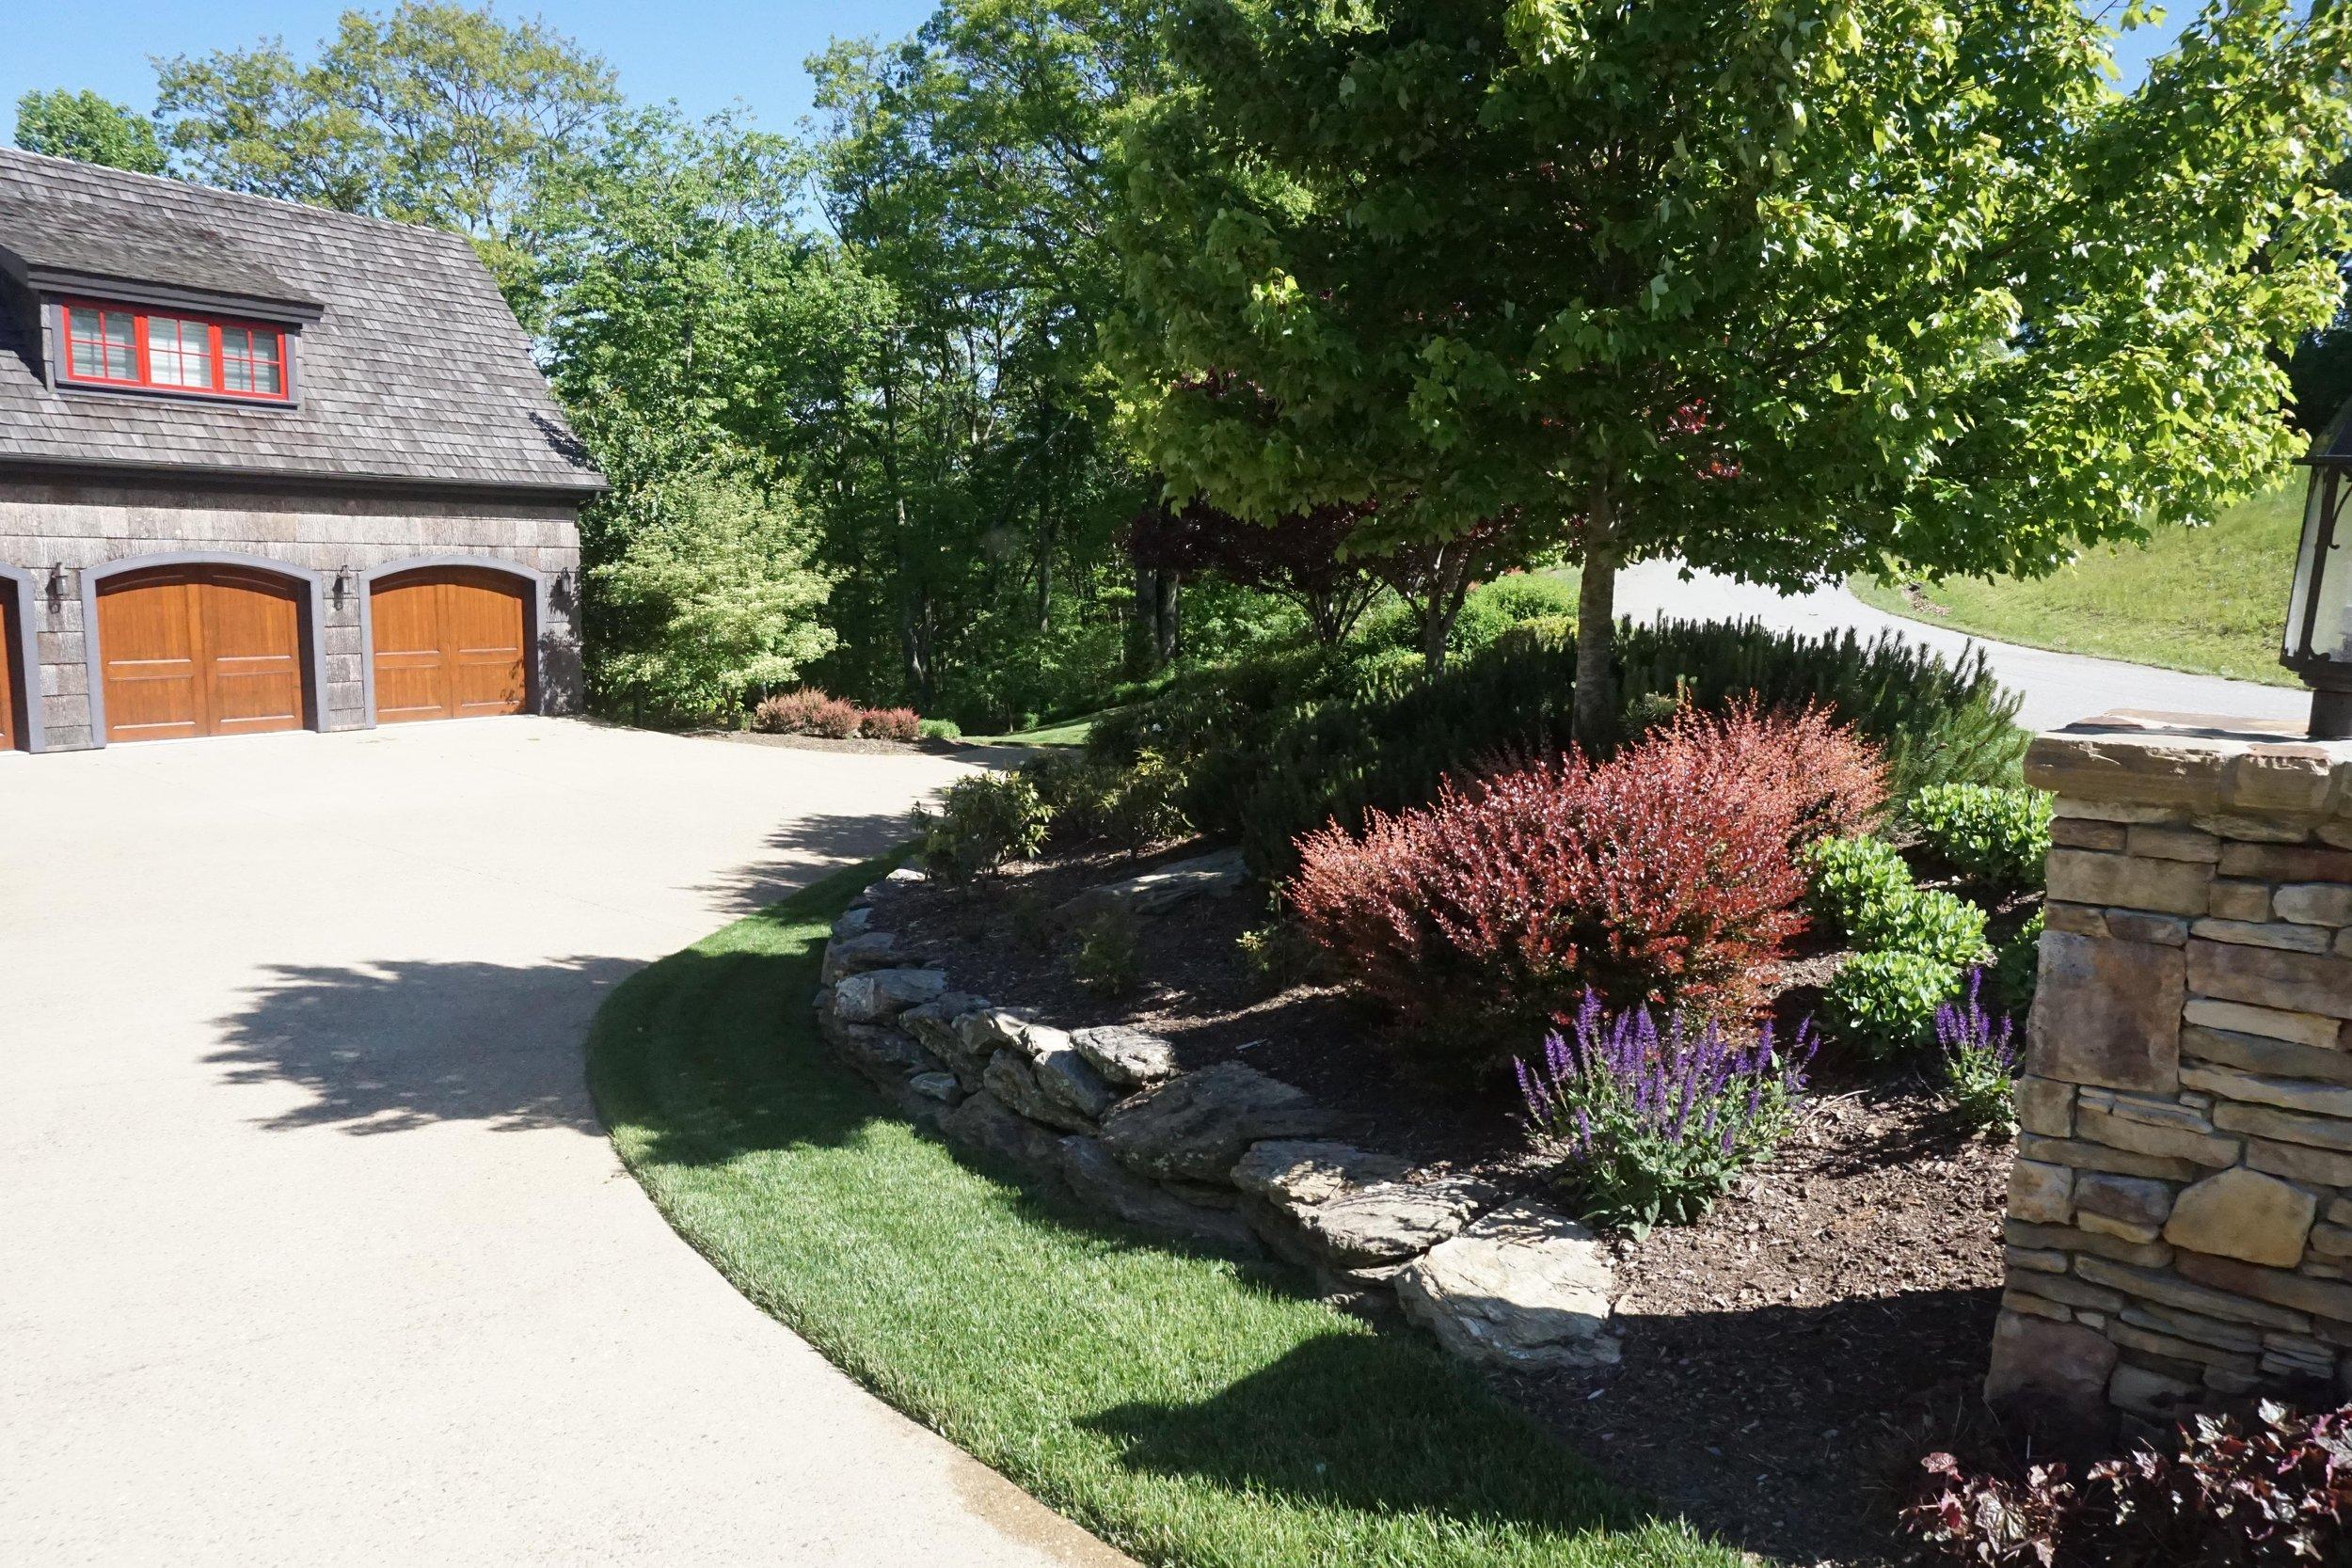 wrens-nest-landscape-high-country-patio-garden-container-installation.jpg